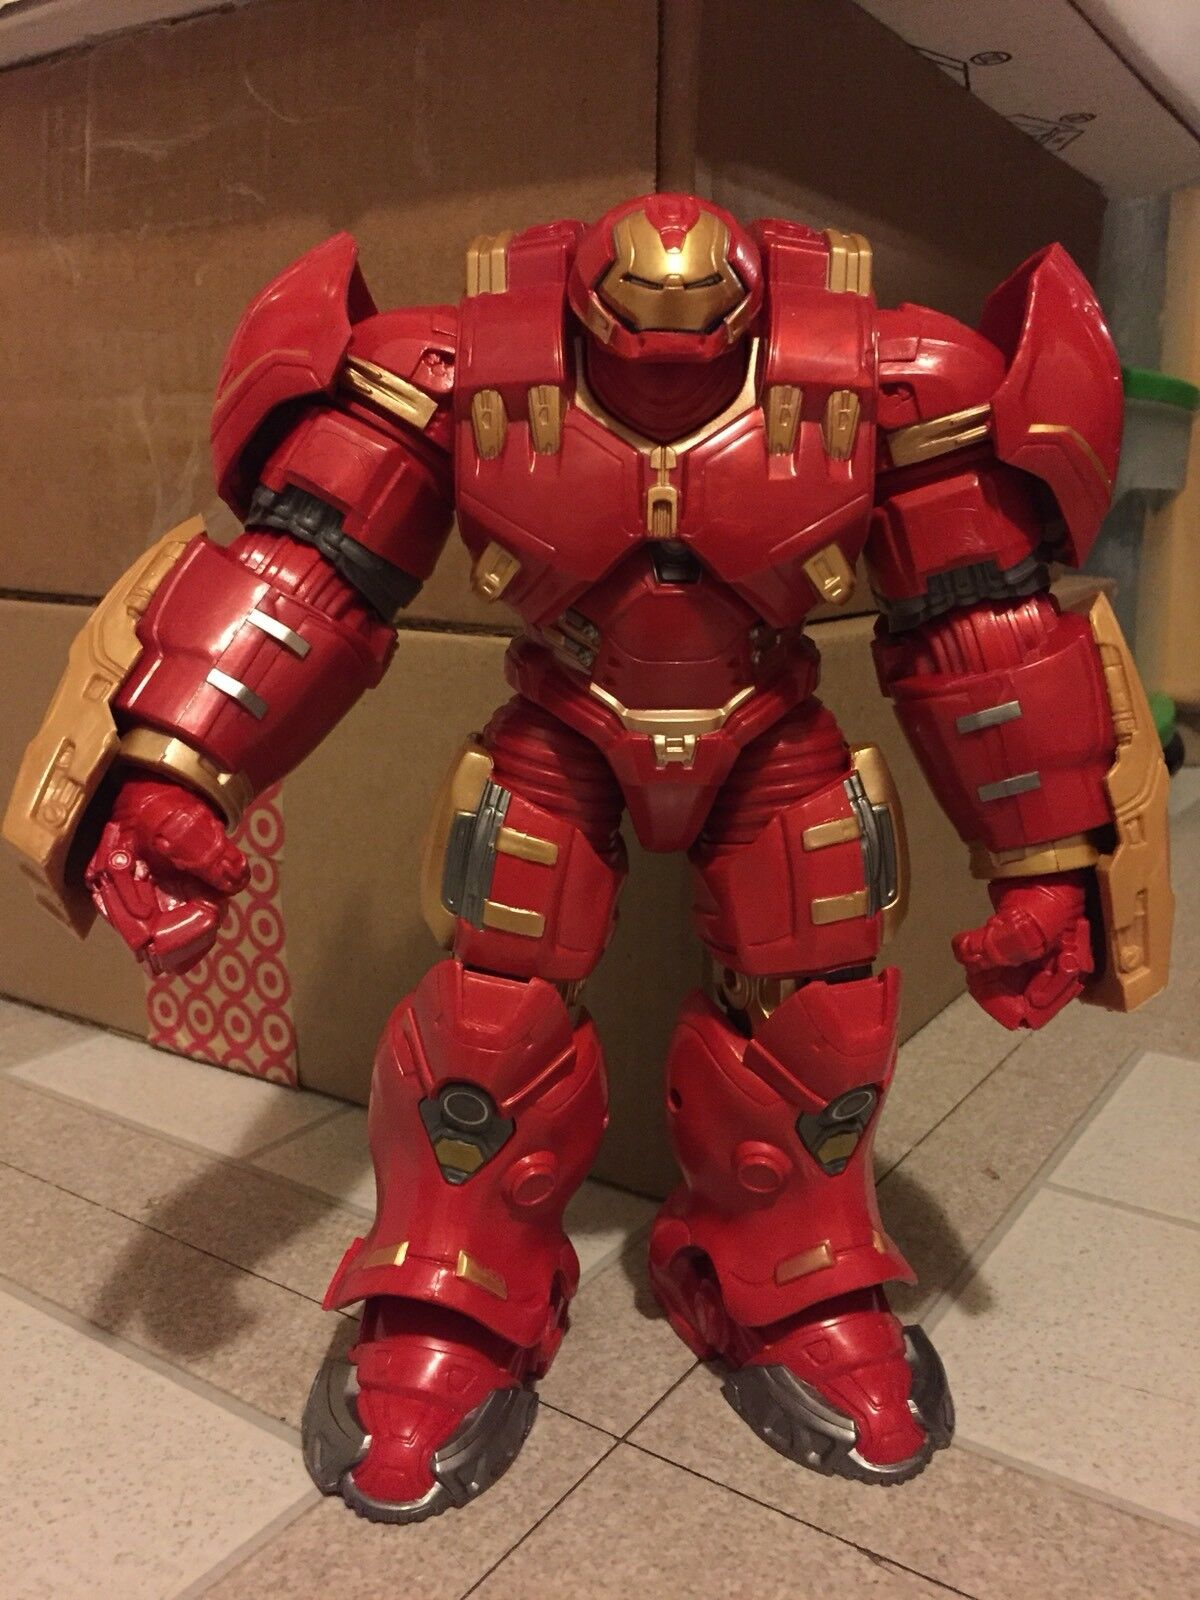 Marvel - legenden hulkbuster   aufbau einer abbildung   100% komplett   baf   iron man